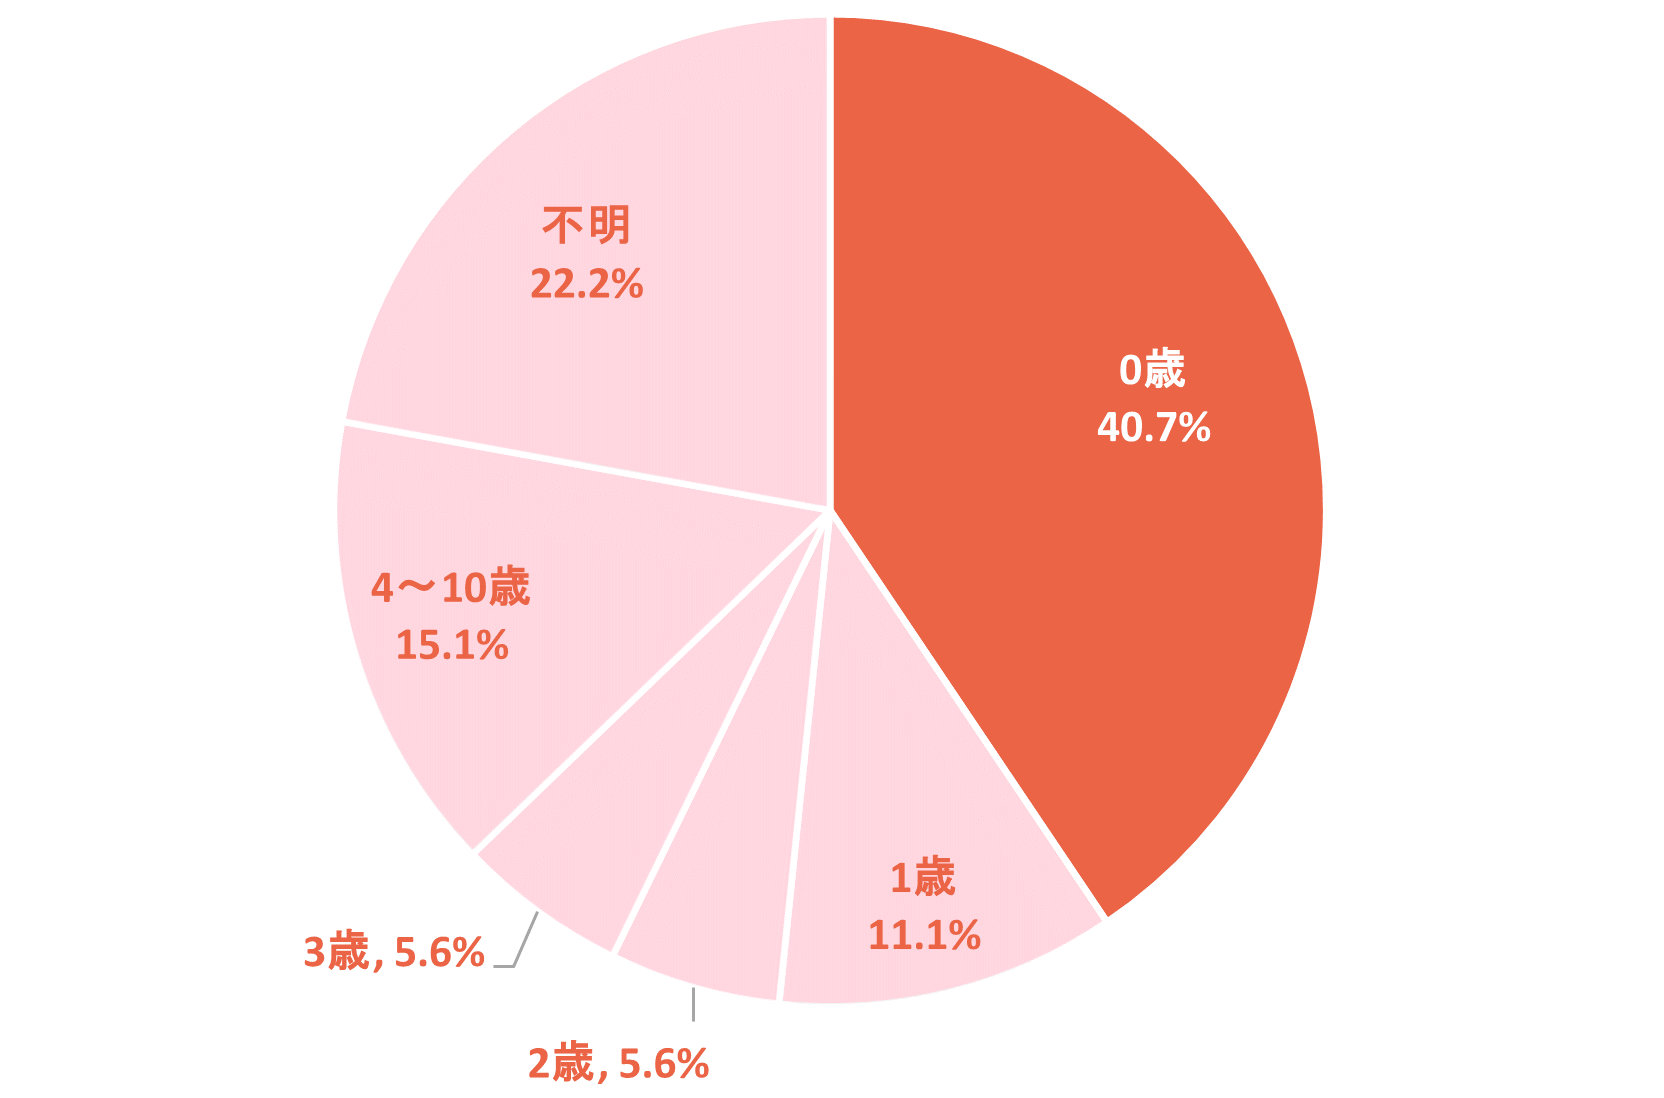 円グラフ「年齢別の死亡件数構成割合(2018年)」0歳40.7%、1歳11.1%、2歳5.6%、3歳5.6%、4~10歳15.1%、不明22.2%